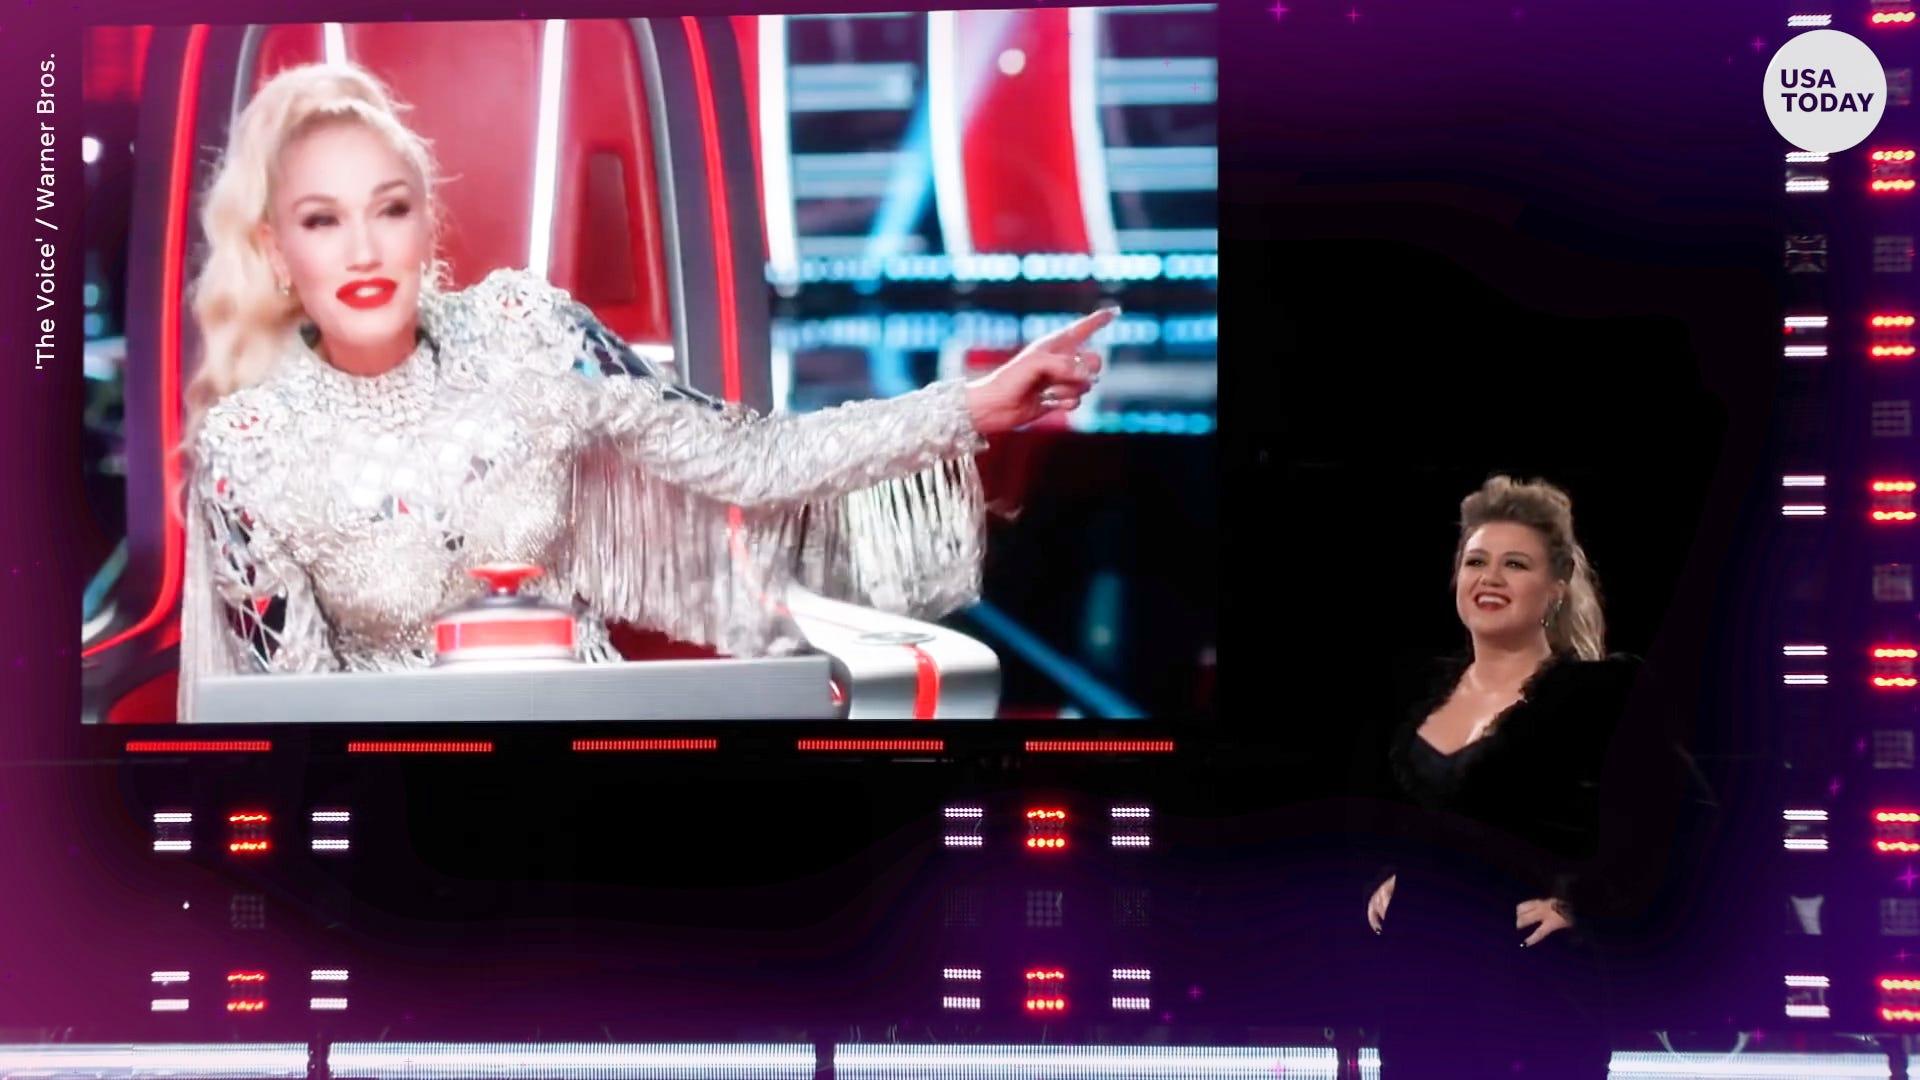 Kelly Clarkson uses a secret weapon, Gwen Stefani, against Blake Shelton on 'The Voice'